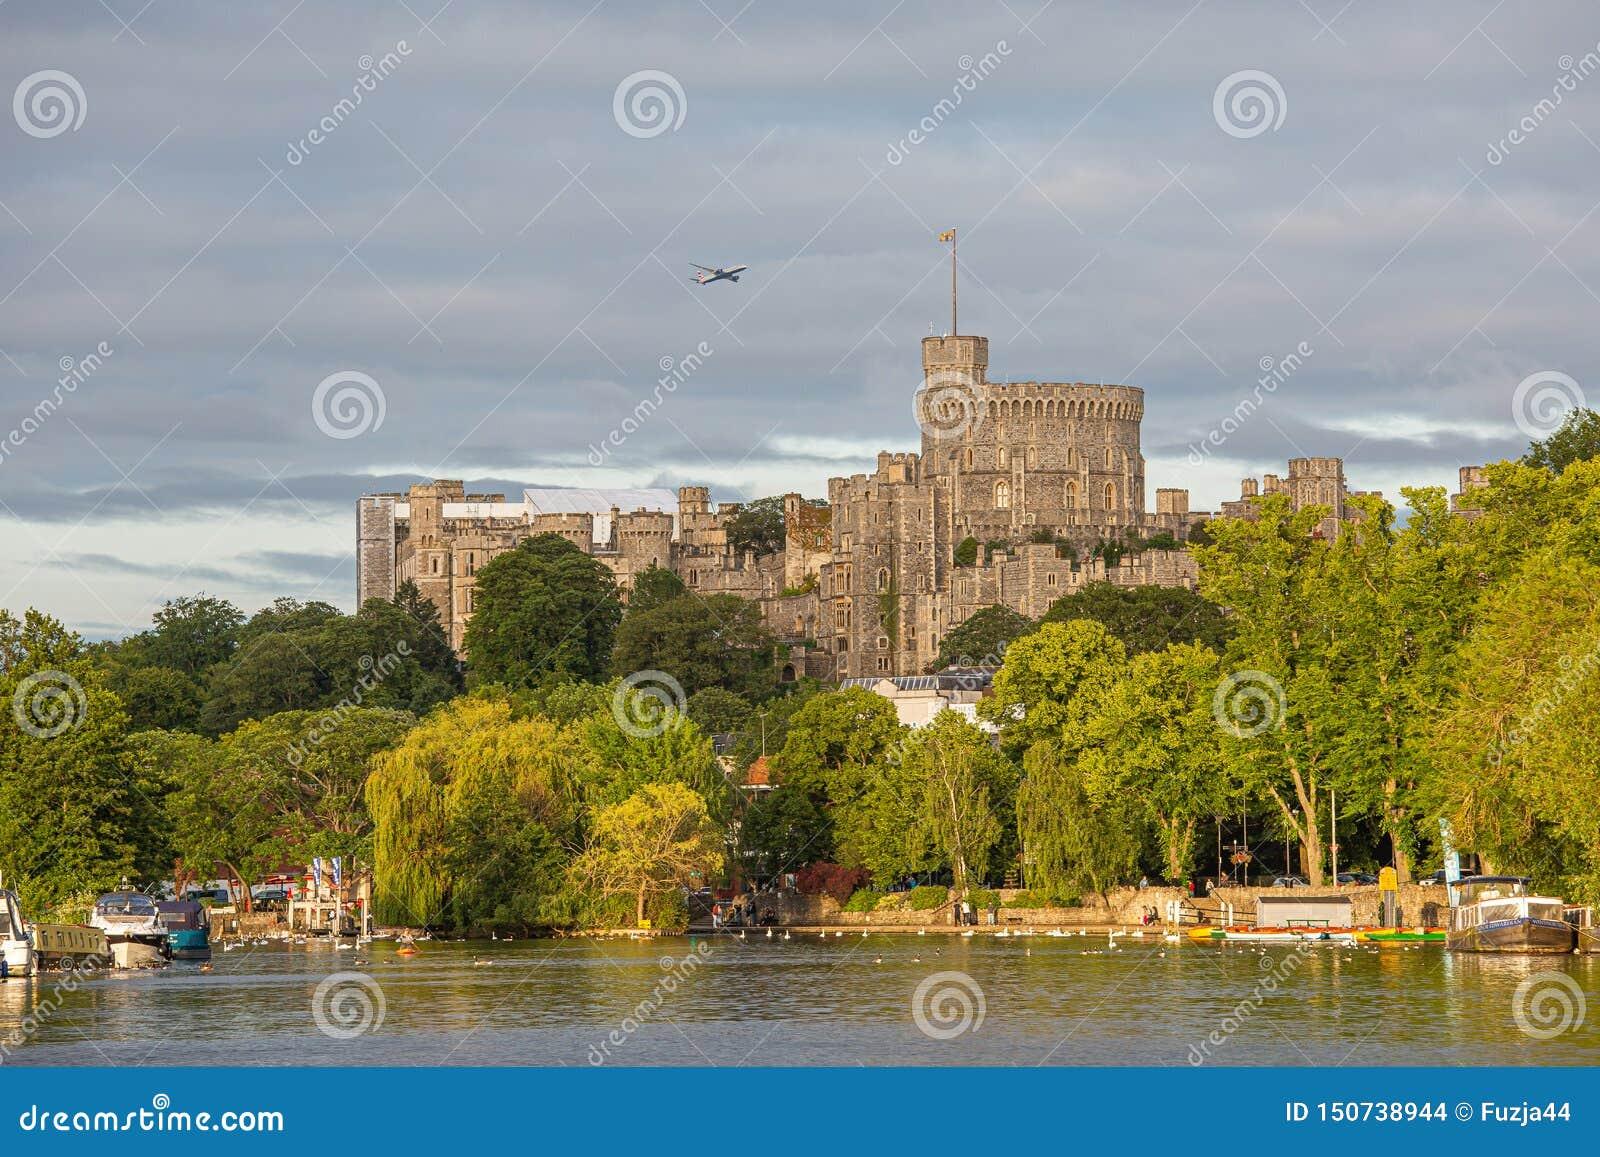 Windsor Castle overlooking the River Thames, England